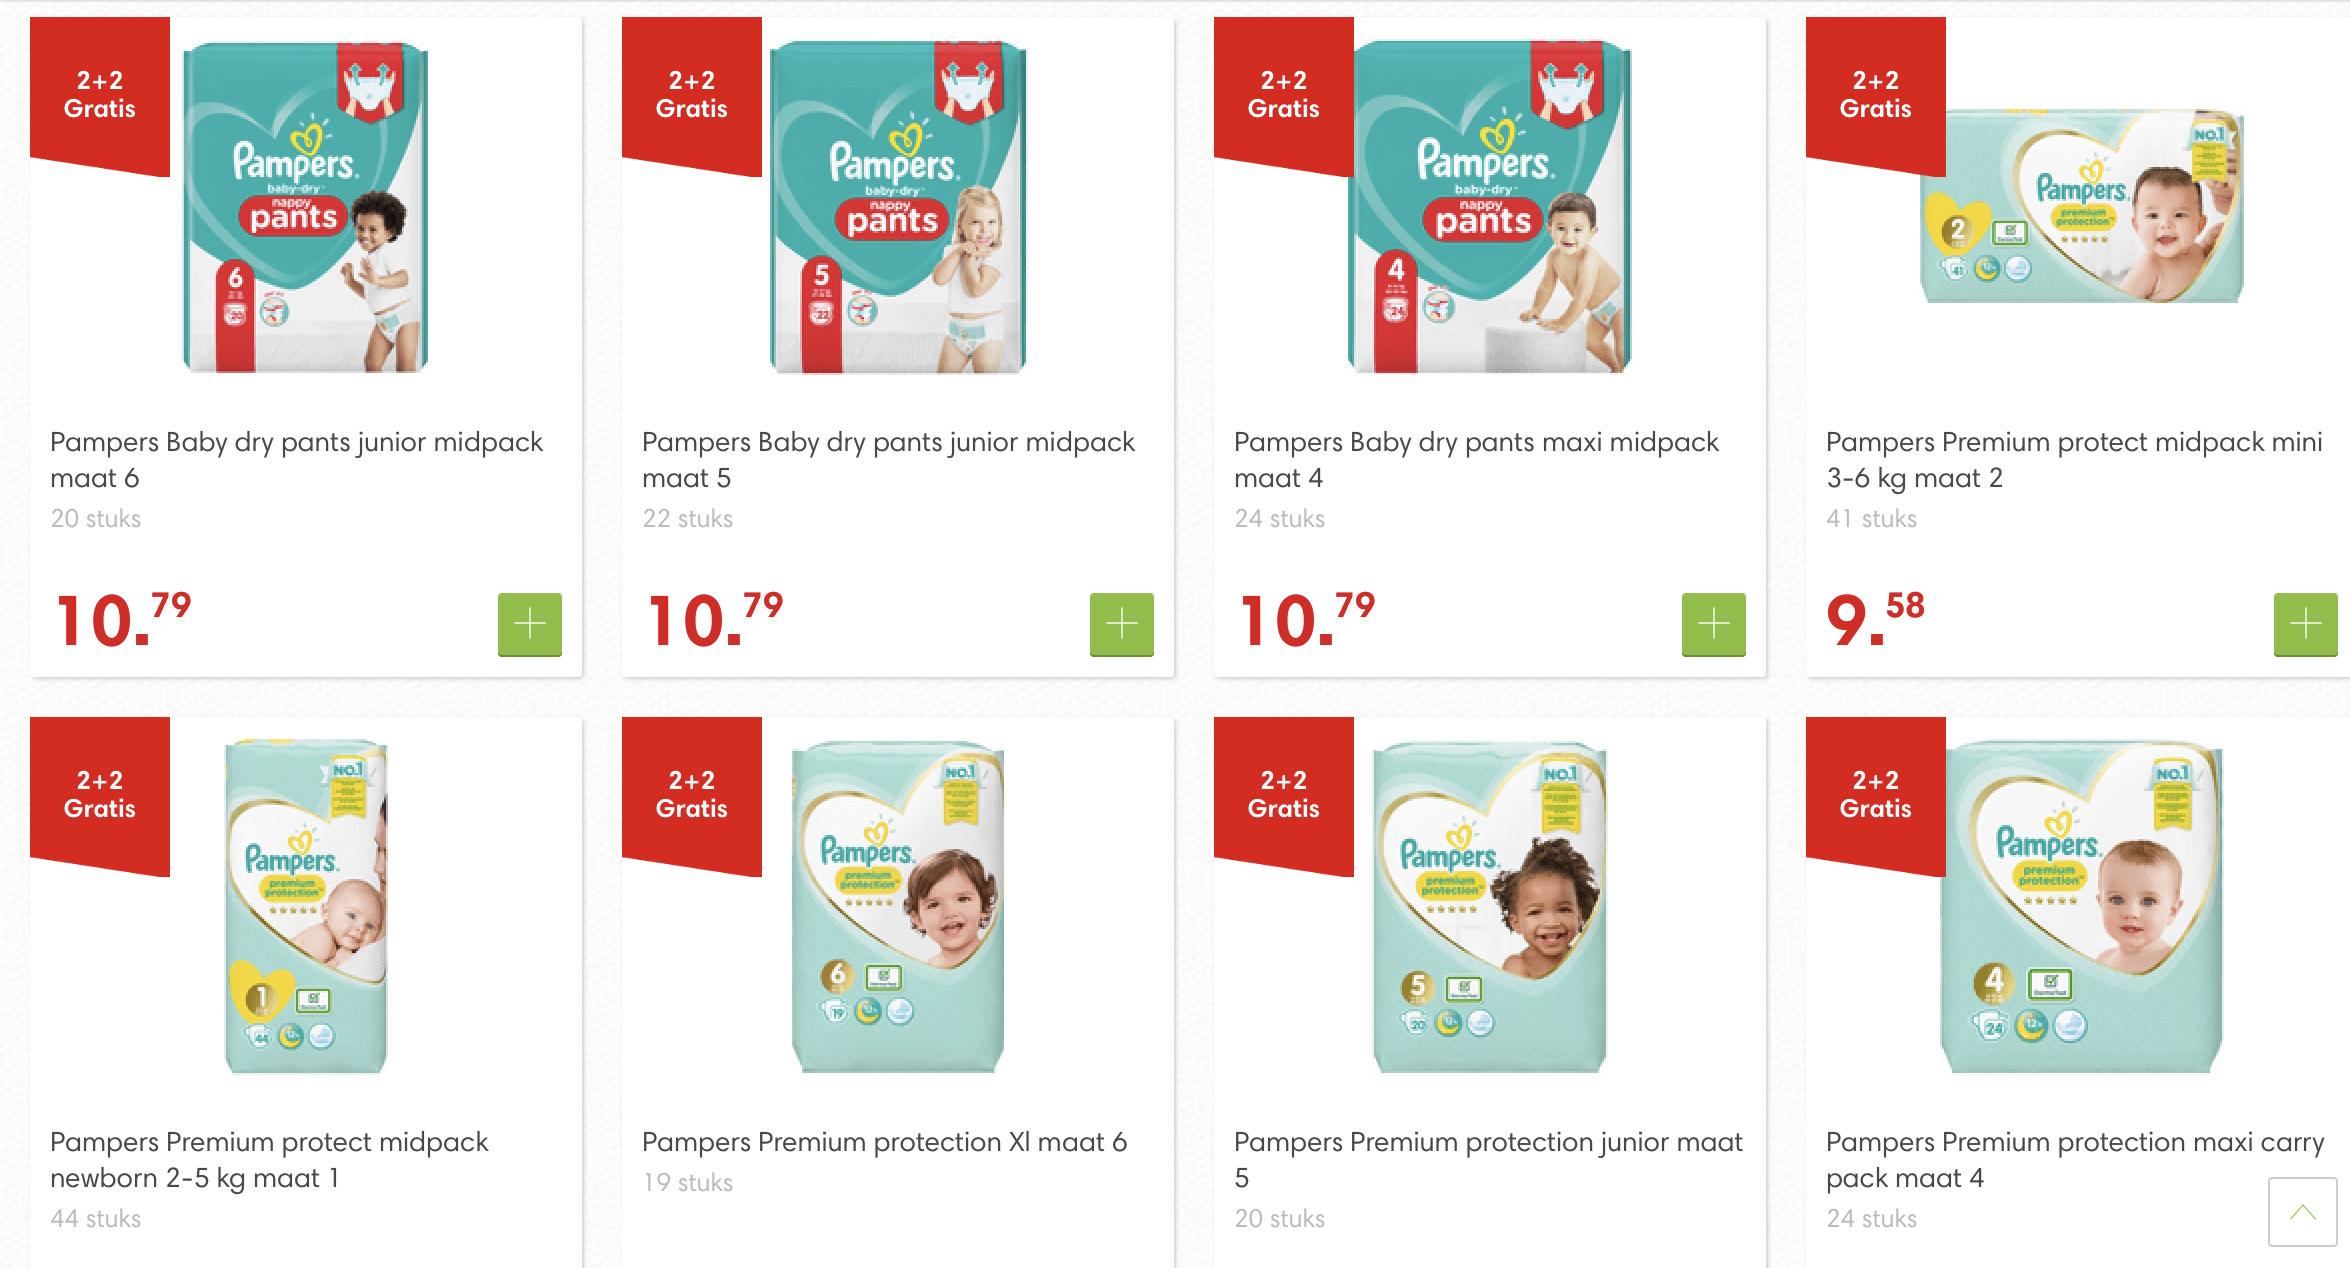 [Dekamarkt] Pampers 2+2 gratis op Dry pants Premium Protection